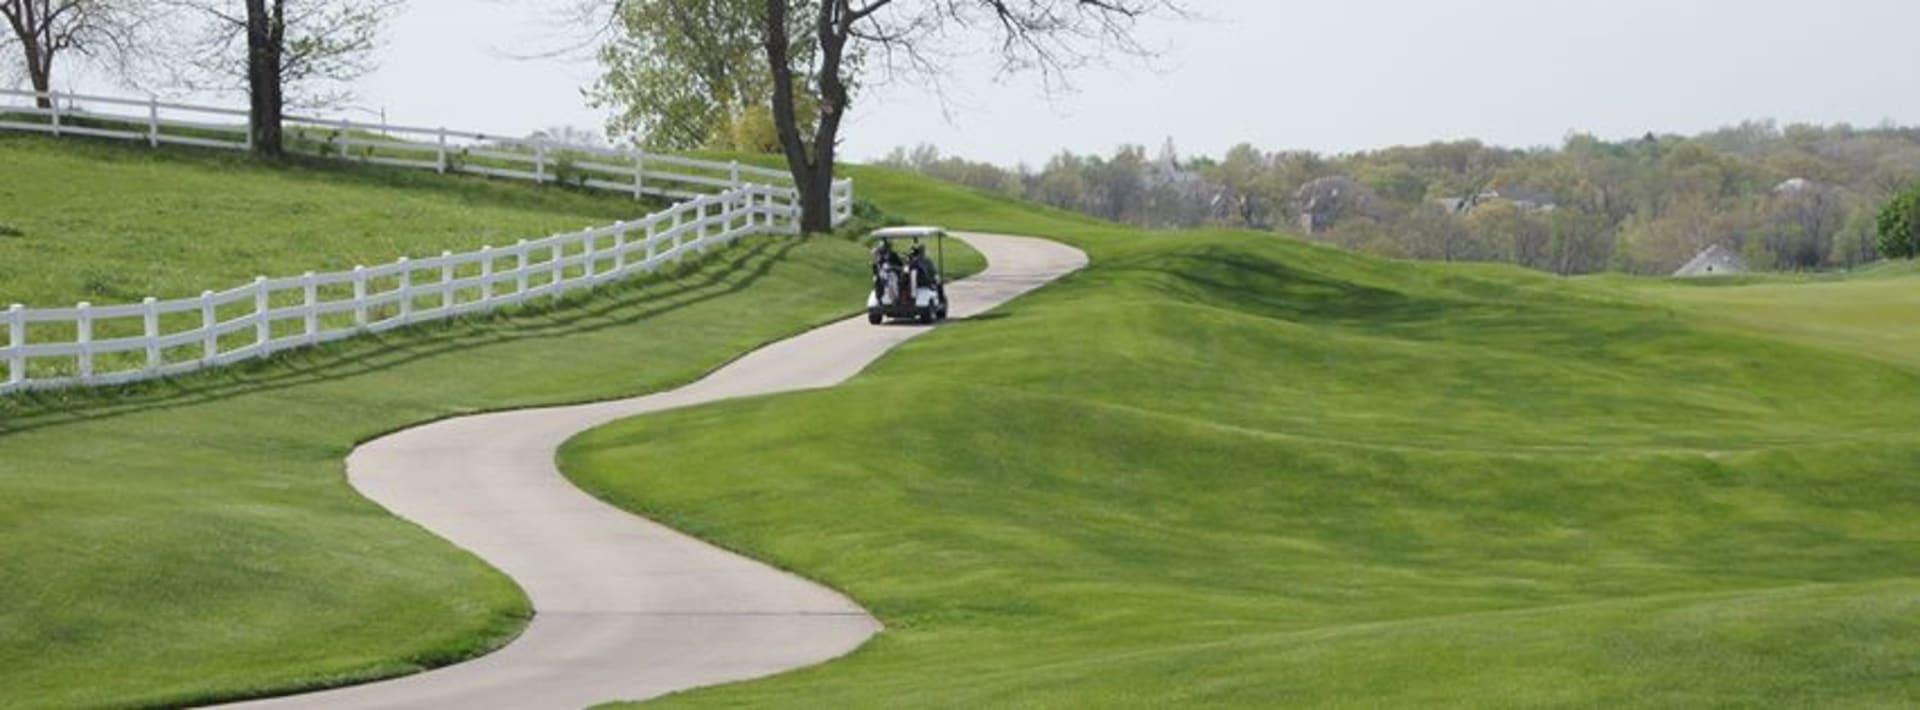 golf-tournament-w1920.jpg